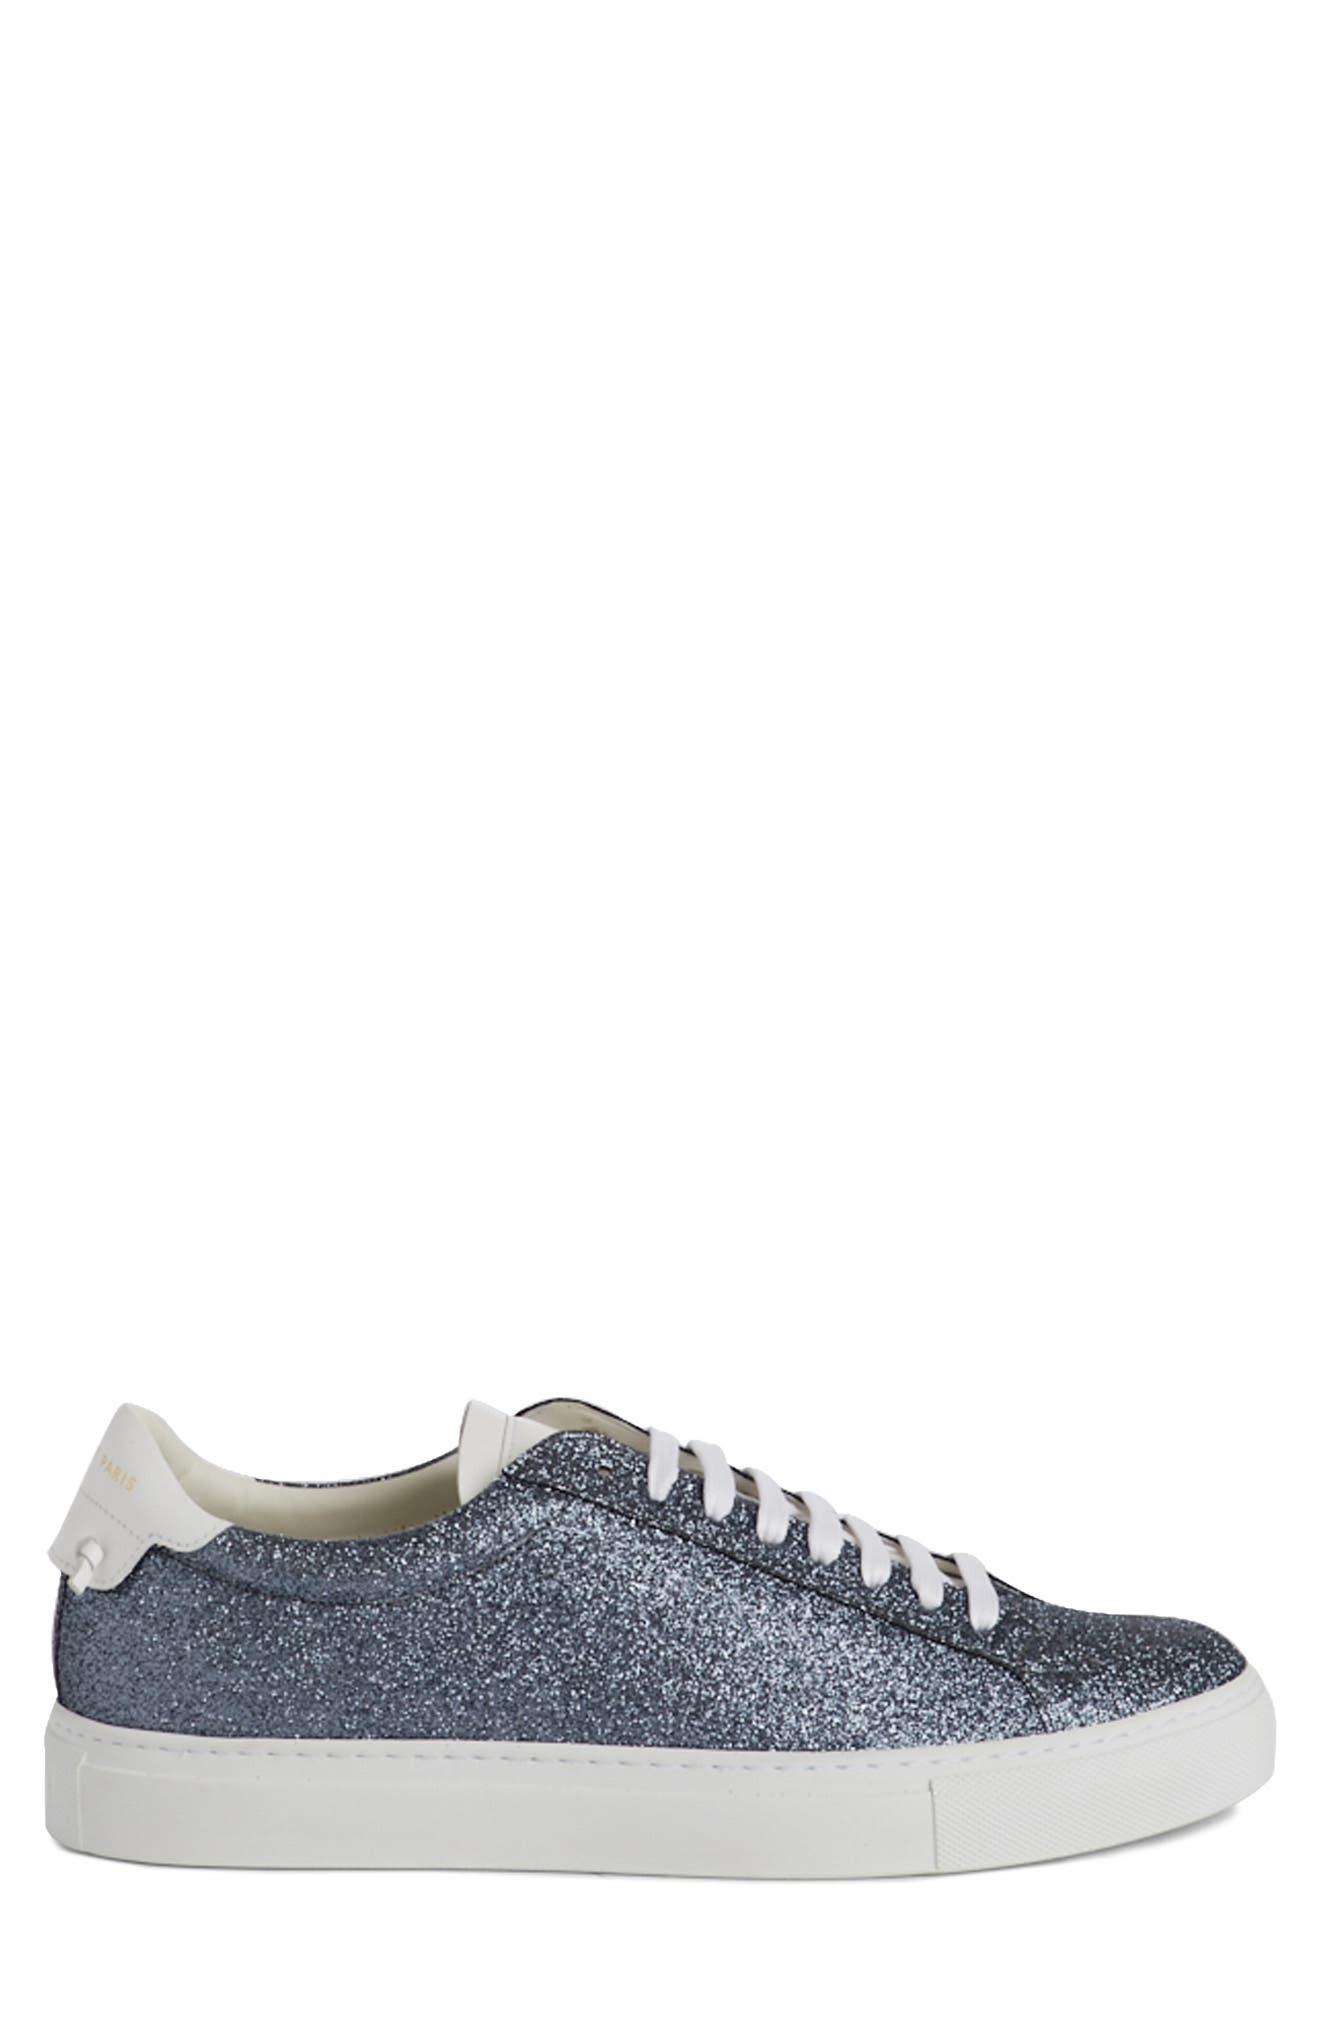 Urban Knots Glitter Sneaker,                             Alternate thumbnail 3, color,                             Grey